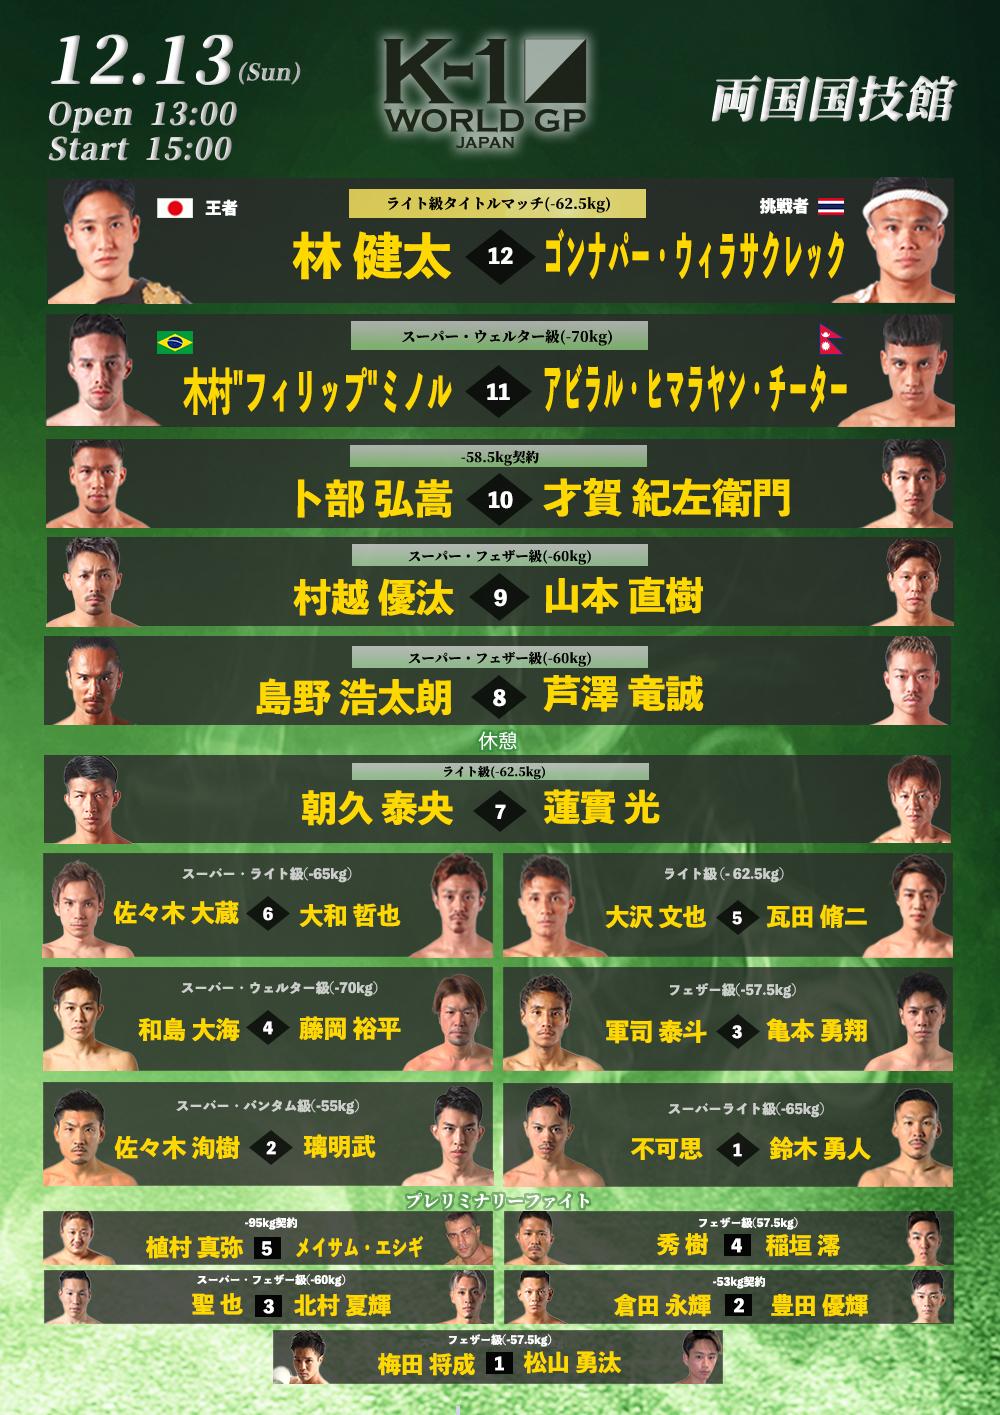 K-1 WORLD GPライト級王者の林健太とゴンナパー・ウィラサクレックのタイトルマッチが最終試合(第12試合)となる (C)K-1